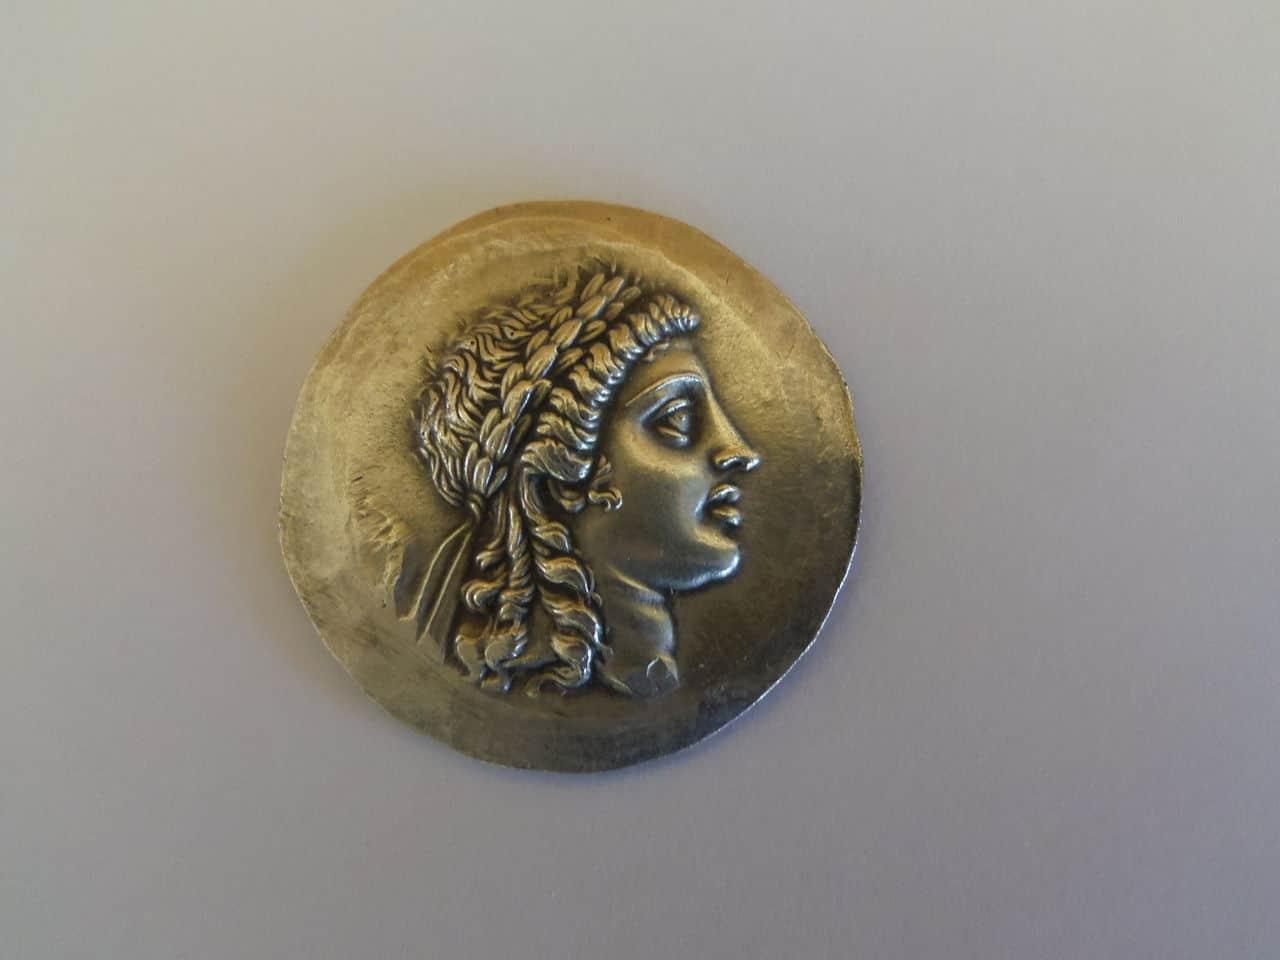 myrina - Tetradracma. Región de Aeolis, ceca Myrina. Reino de Pérgamo (155-145 a.C.) Anverso